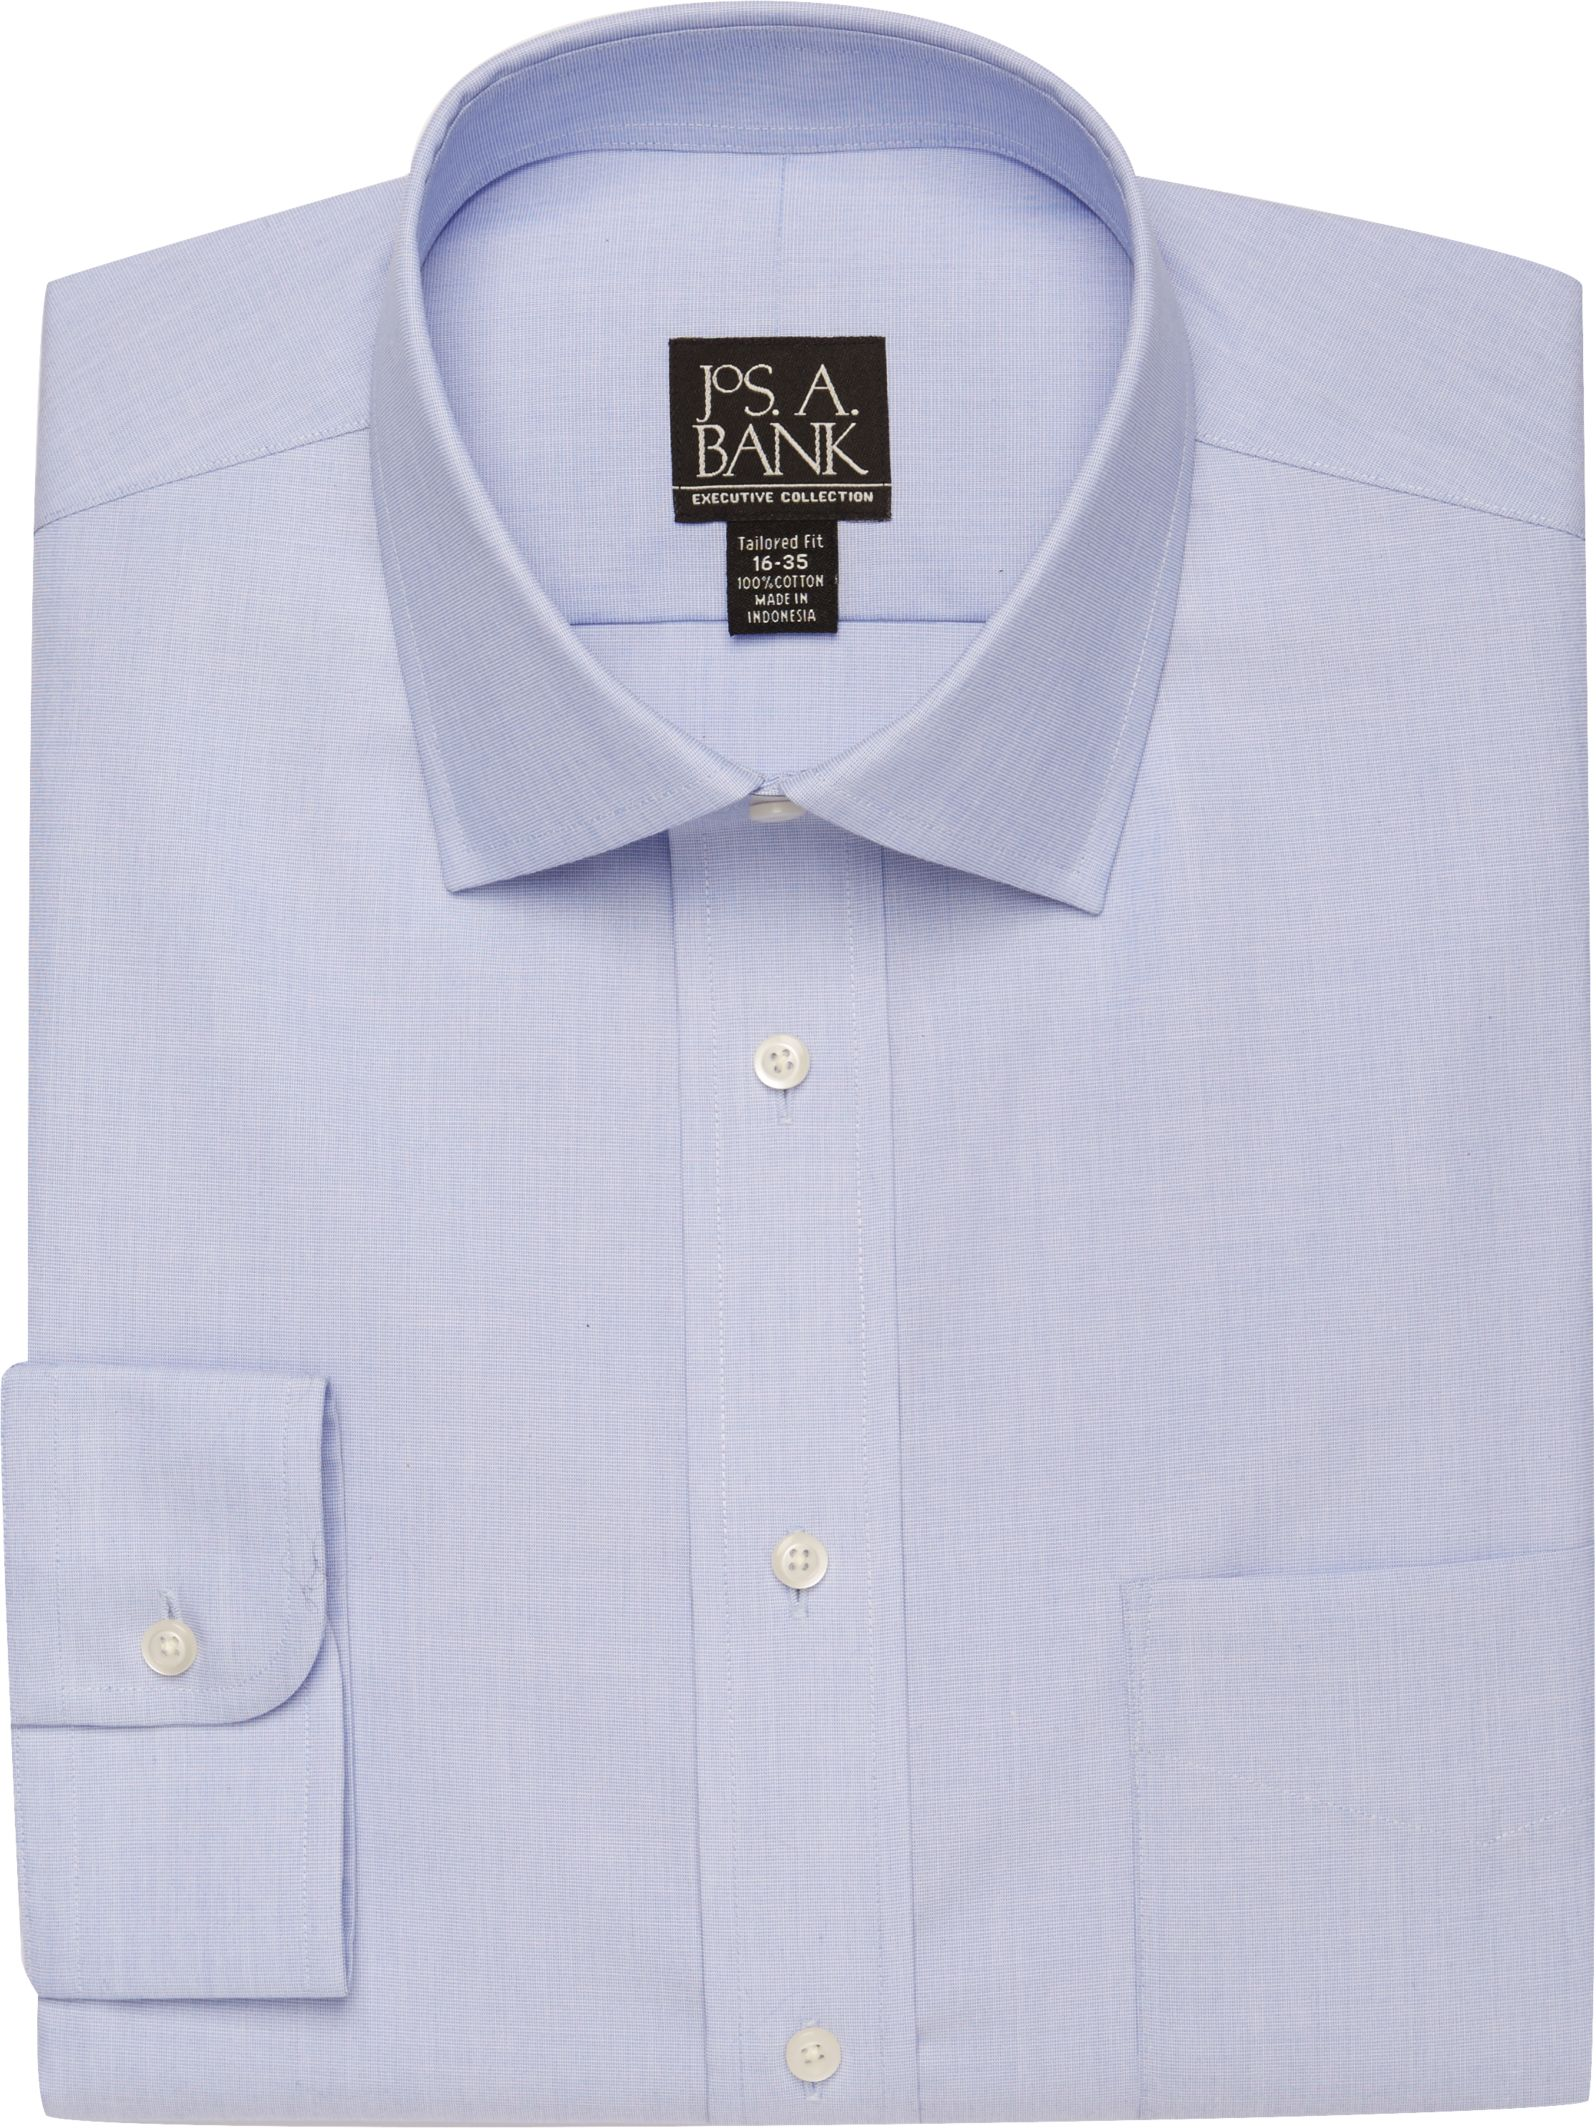 9 month white dress shirt 16